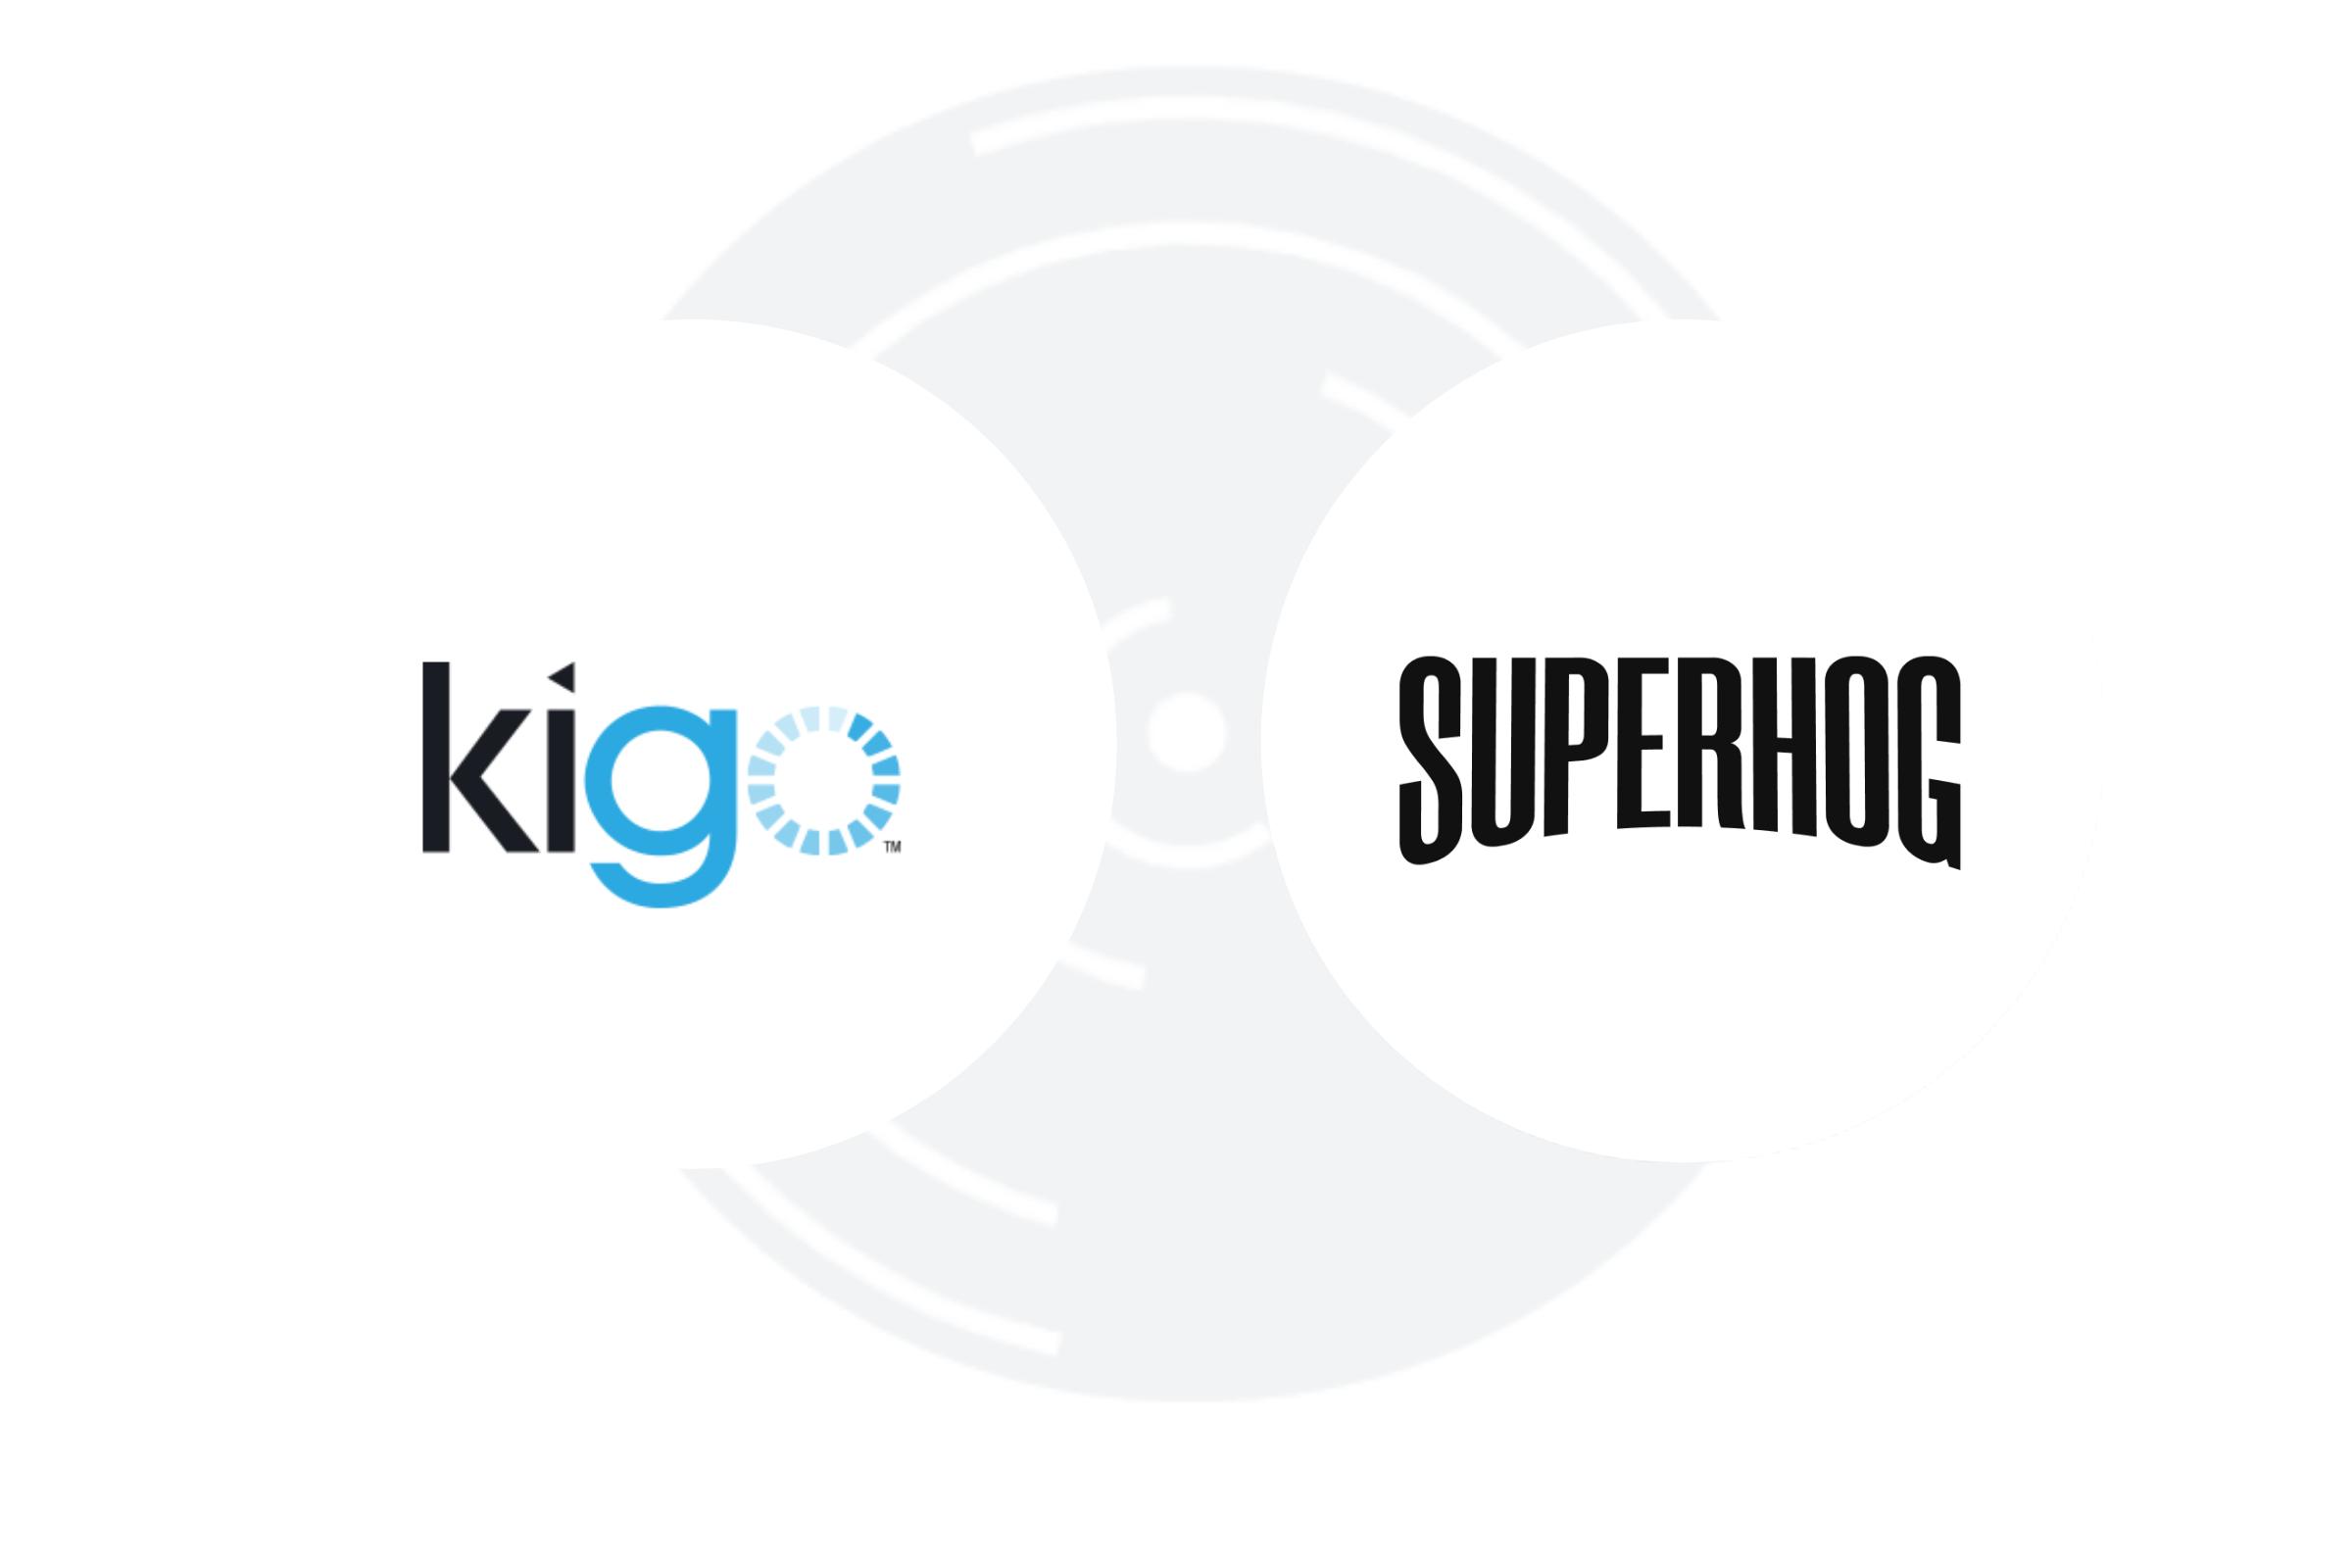 Kigo landing page